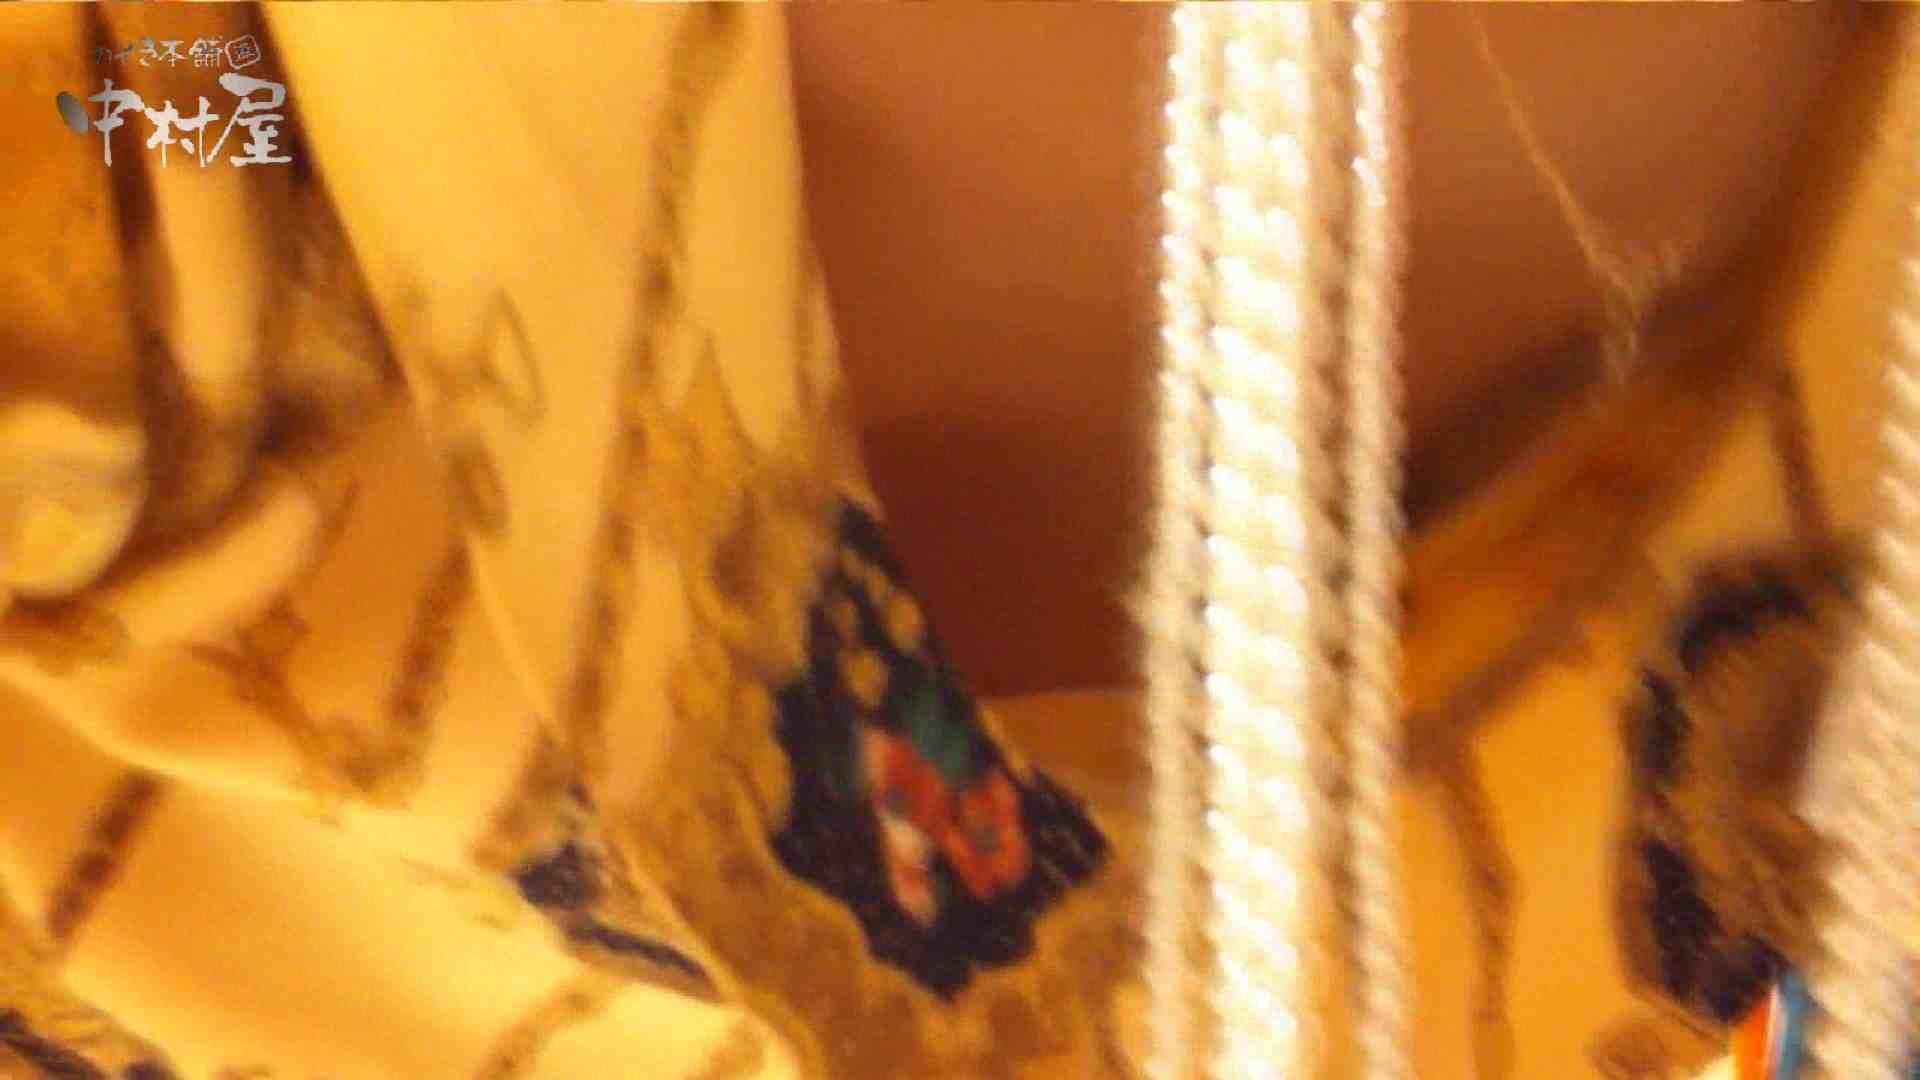 vol.71 美人アパレル胸チラ&パンチラ クイコミパンツでお買い物 チラ歓迎 エロ画像 82pic 77